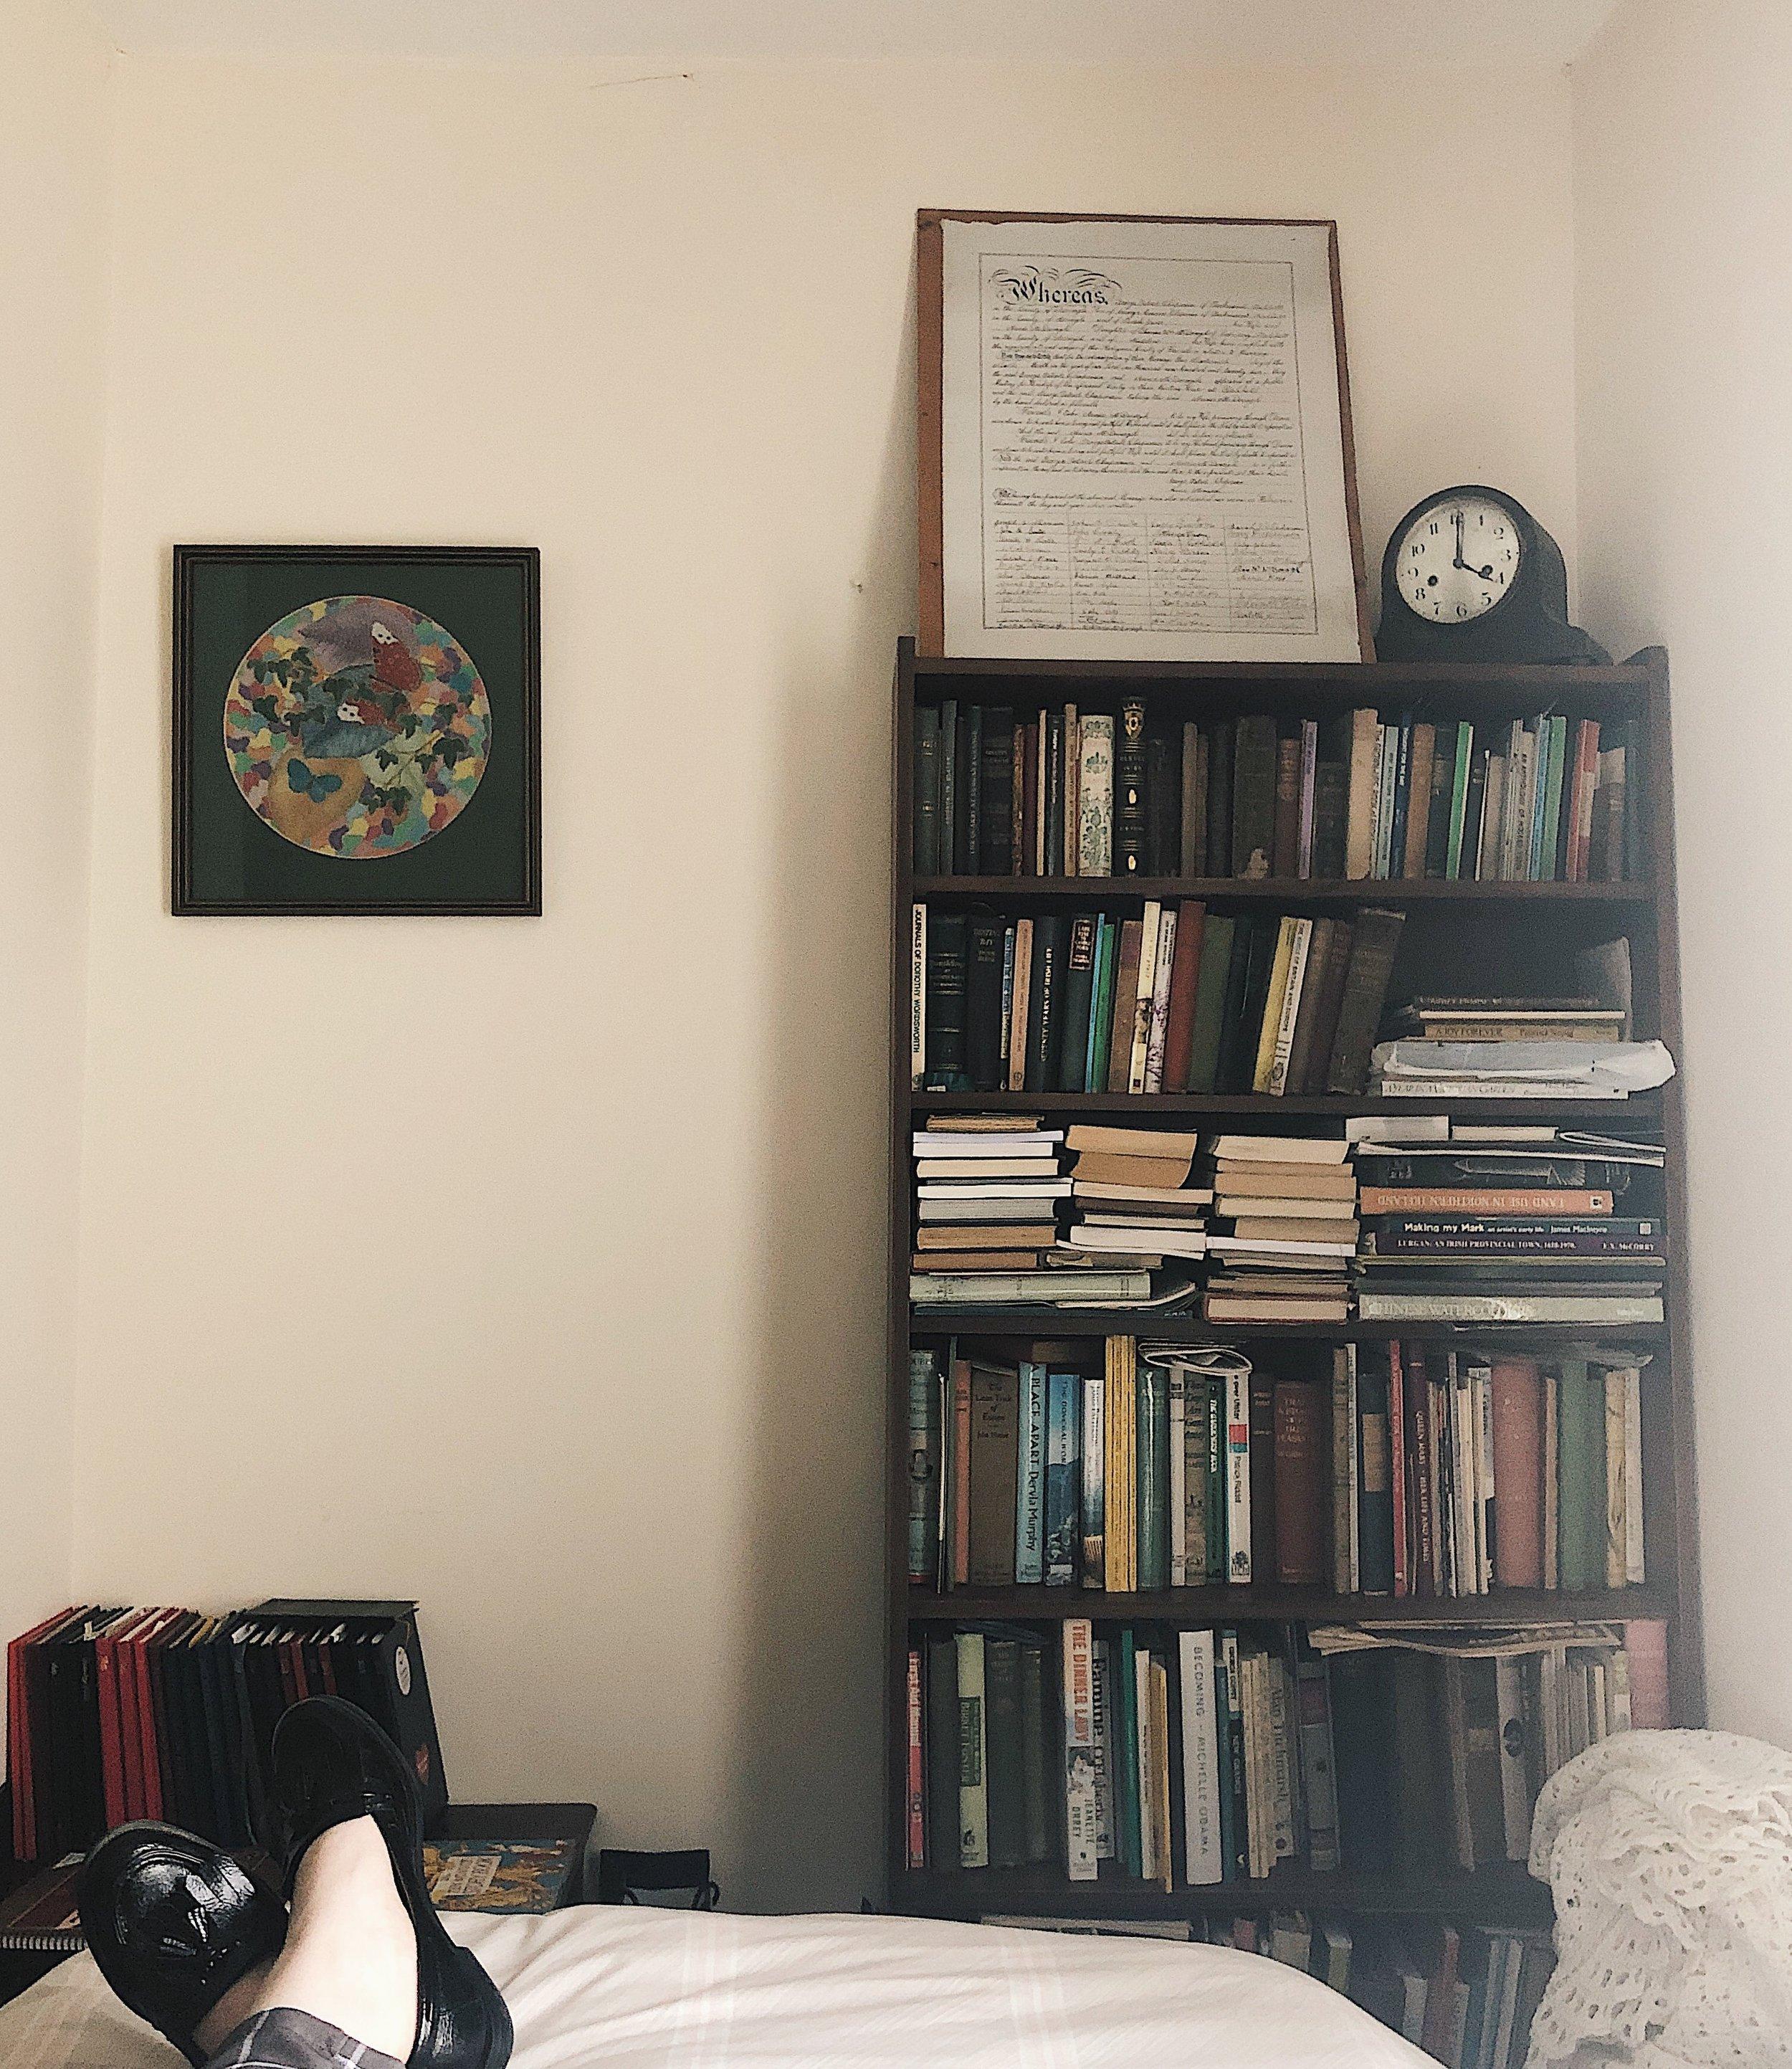 Jessica Armstrong Summer Reads 2019 The Attic on Eighth Bookshelf.JPG